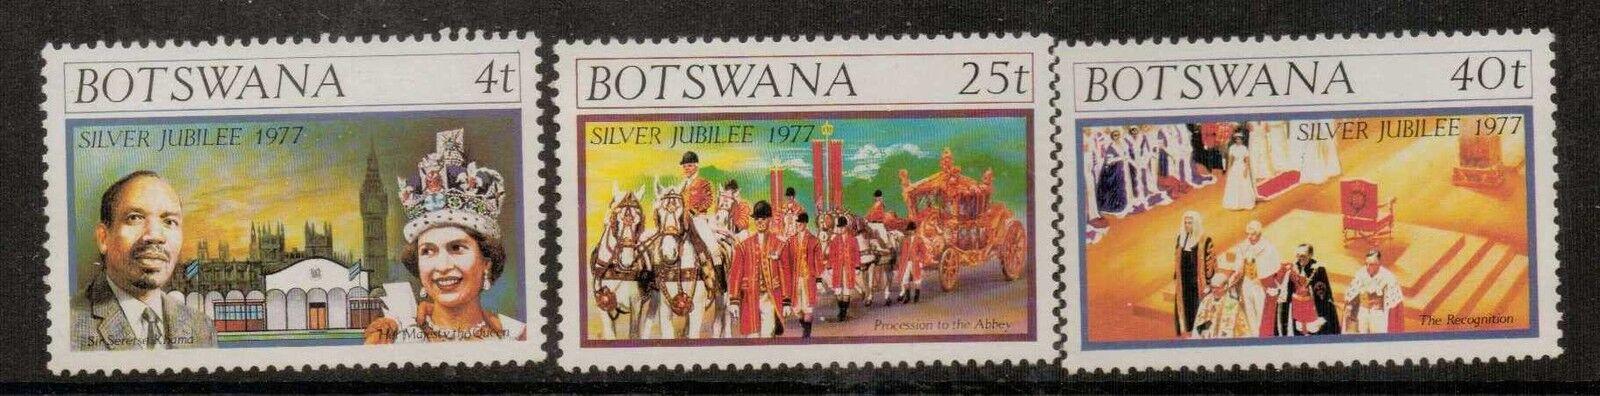 BOTSWANA SG391/3 1977 SILVER JUBILEE MNH